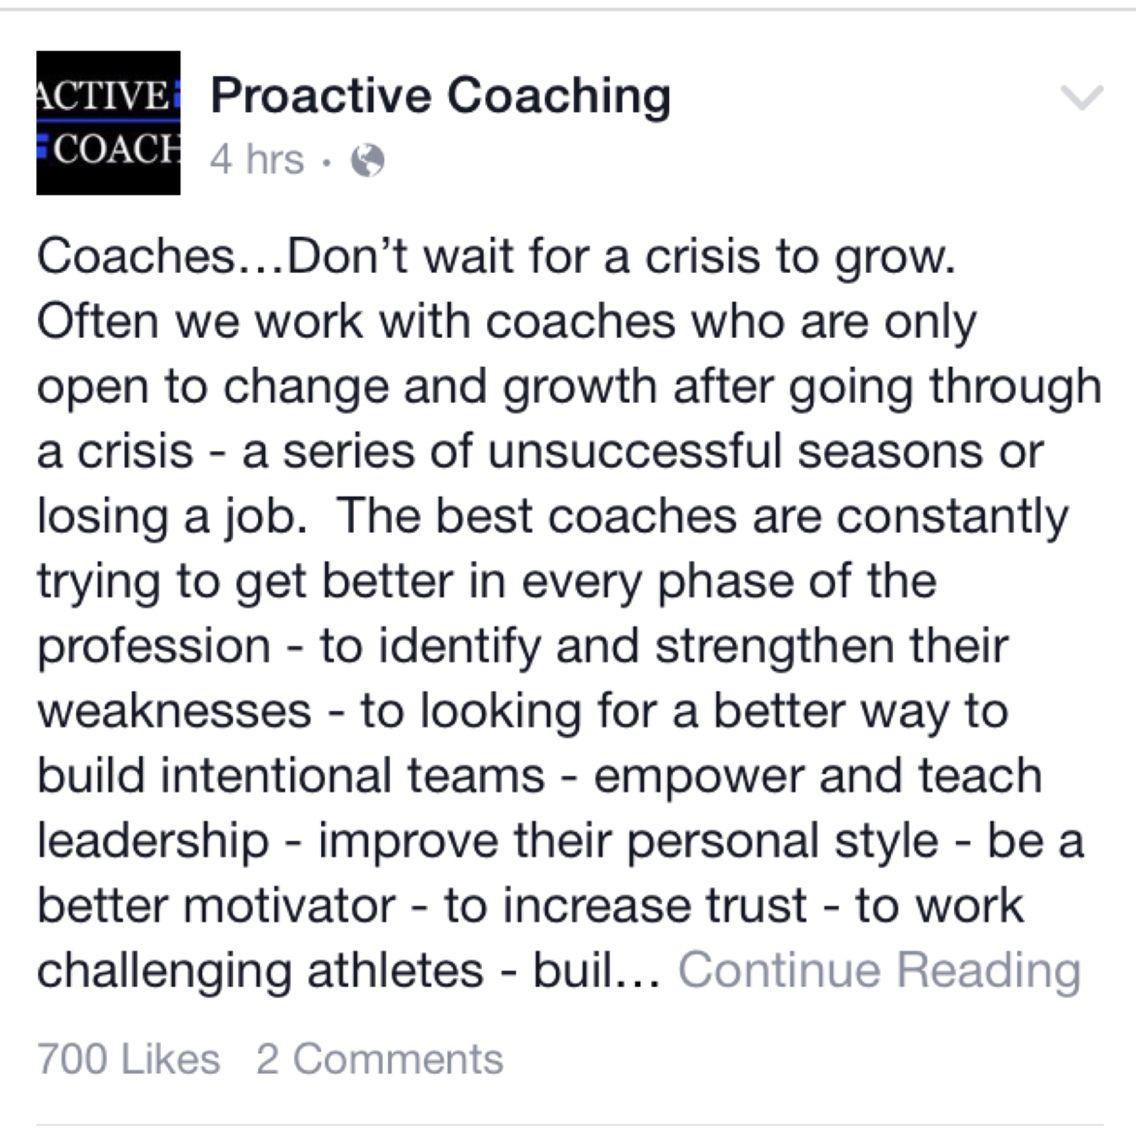 proactivecoaching Proactive, Lost job, Coaching